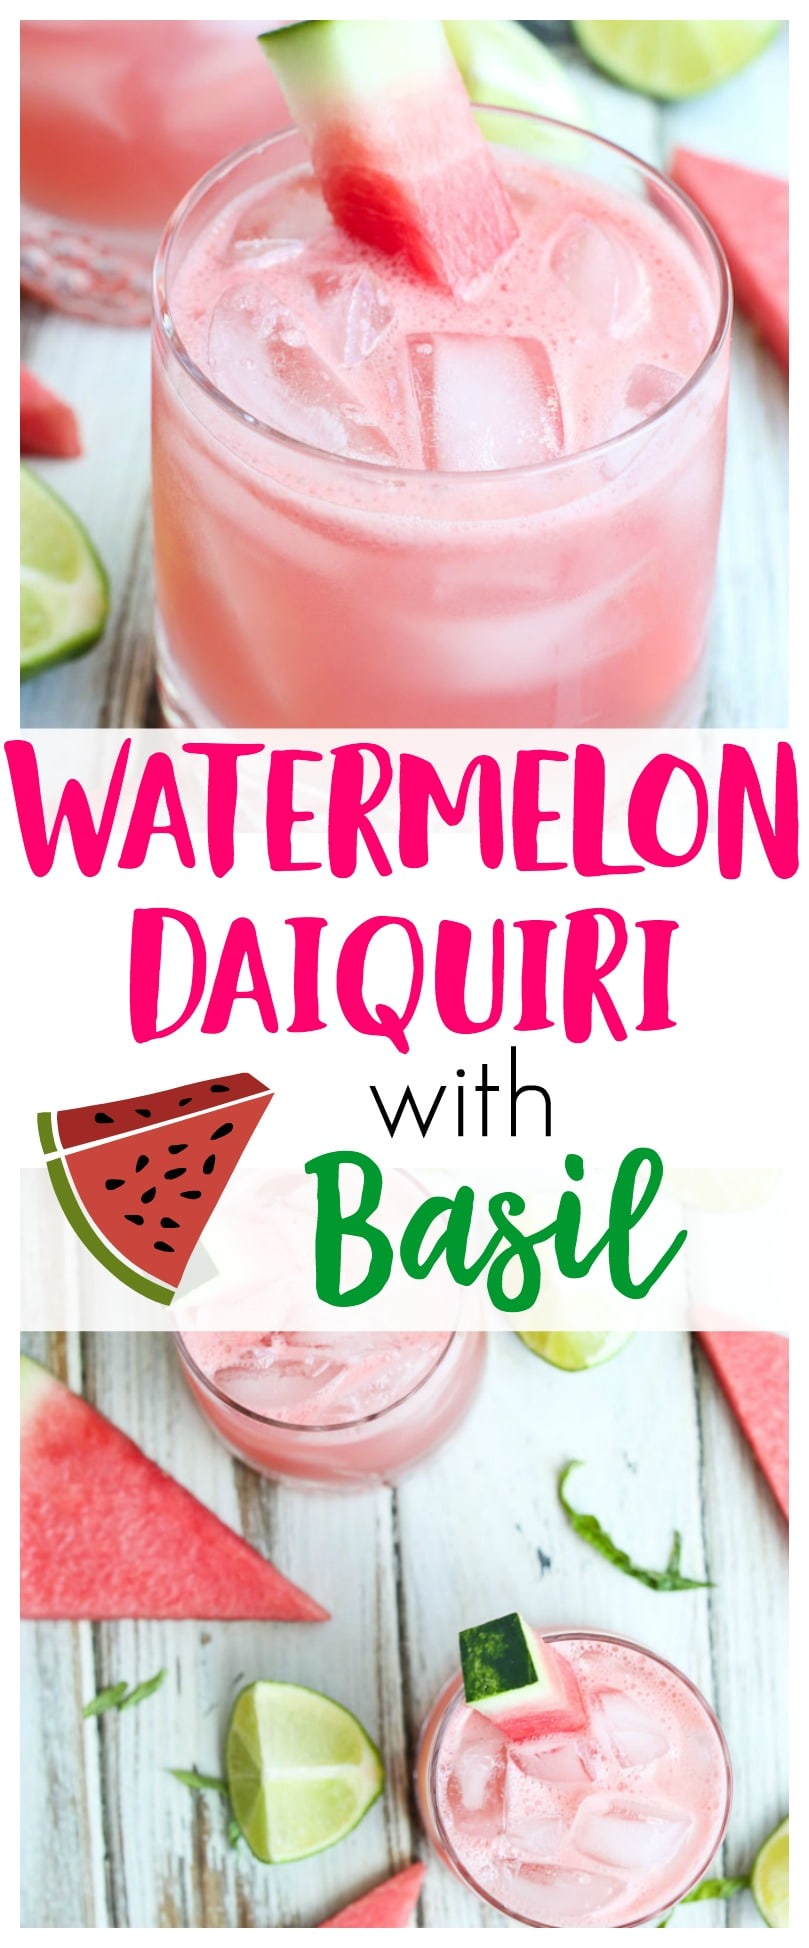 Watermelon Daiquiri Recipe | cocktail with basil | rum cocktails | summer cocktails | watermelon cocktails